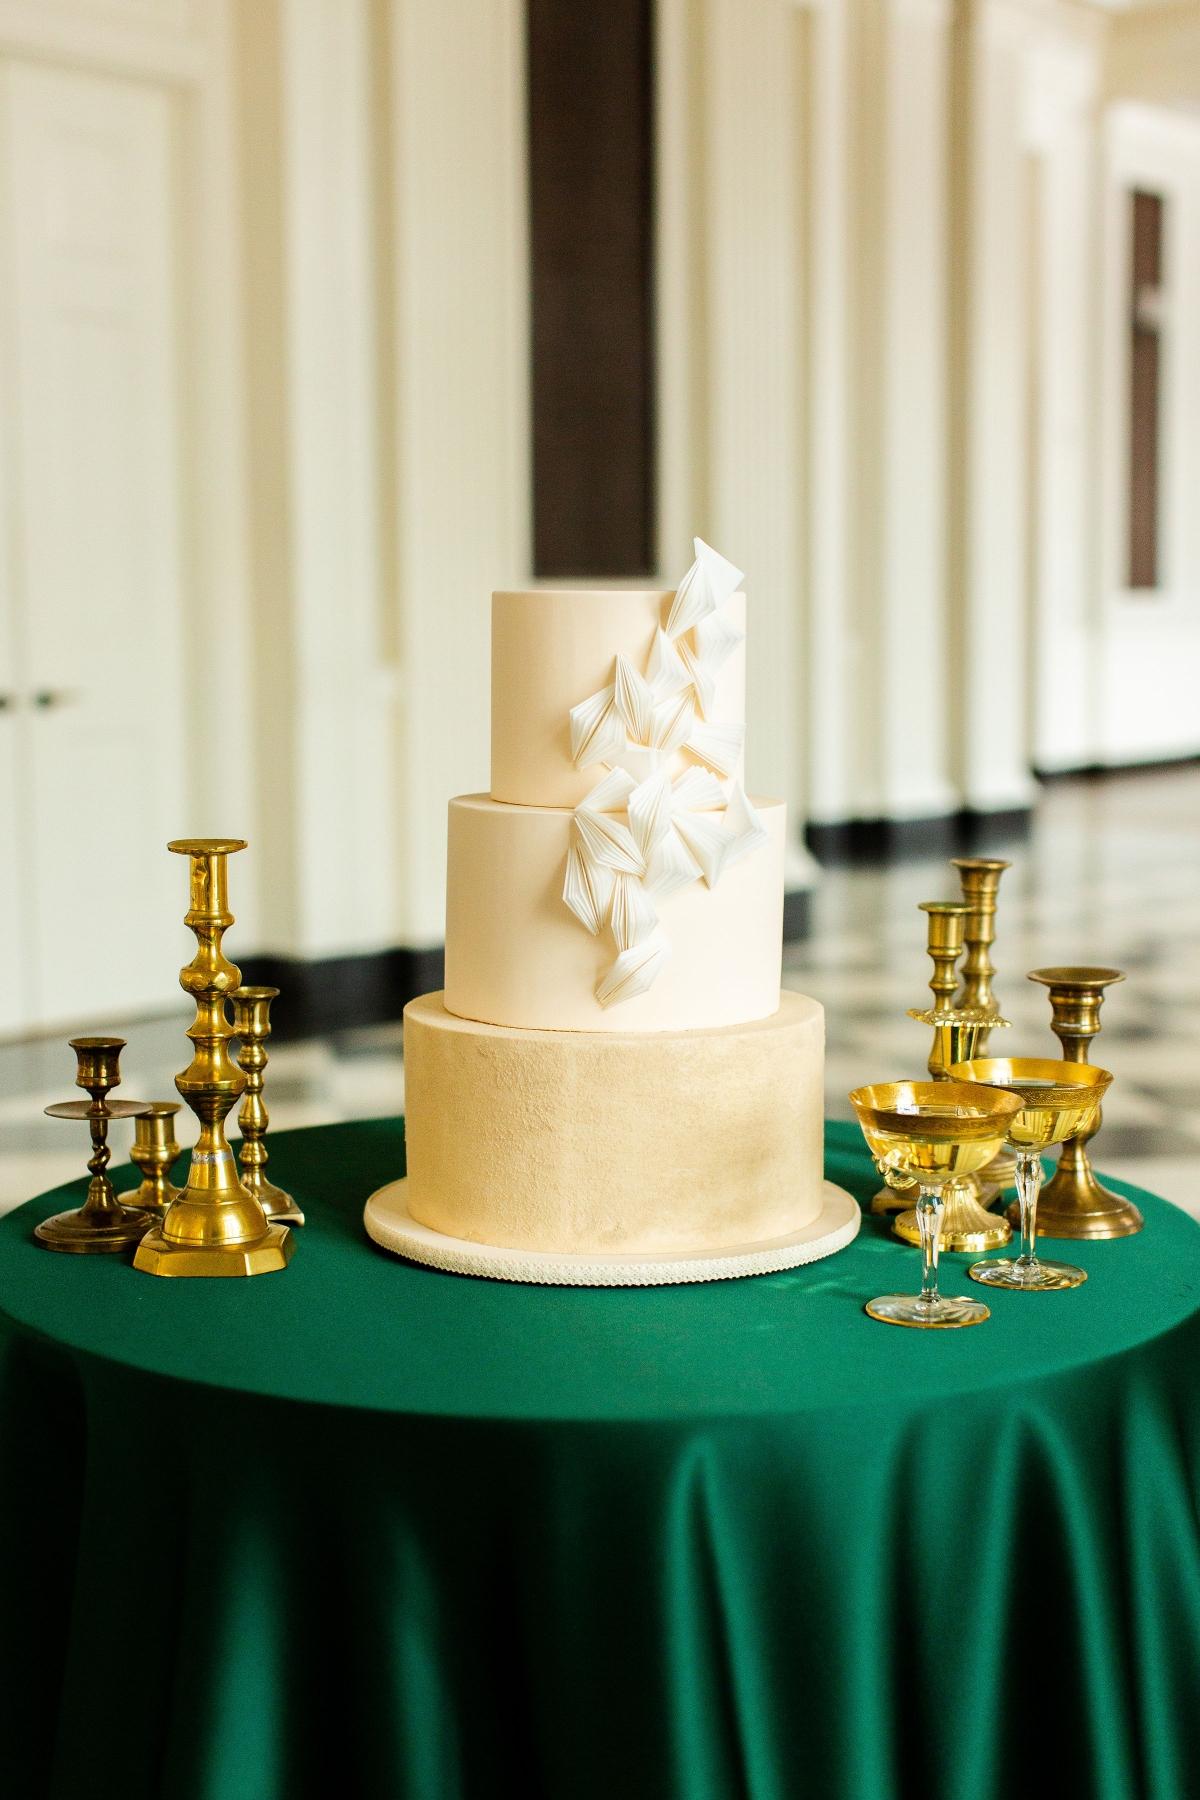 Wedding Cake with Art Deco Fan